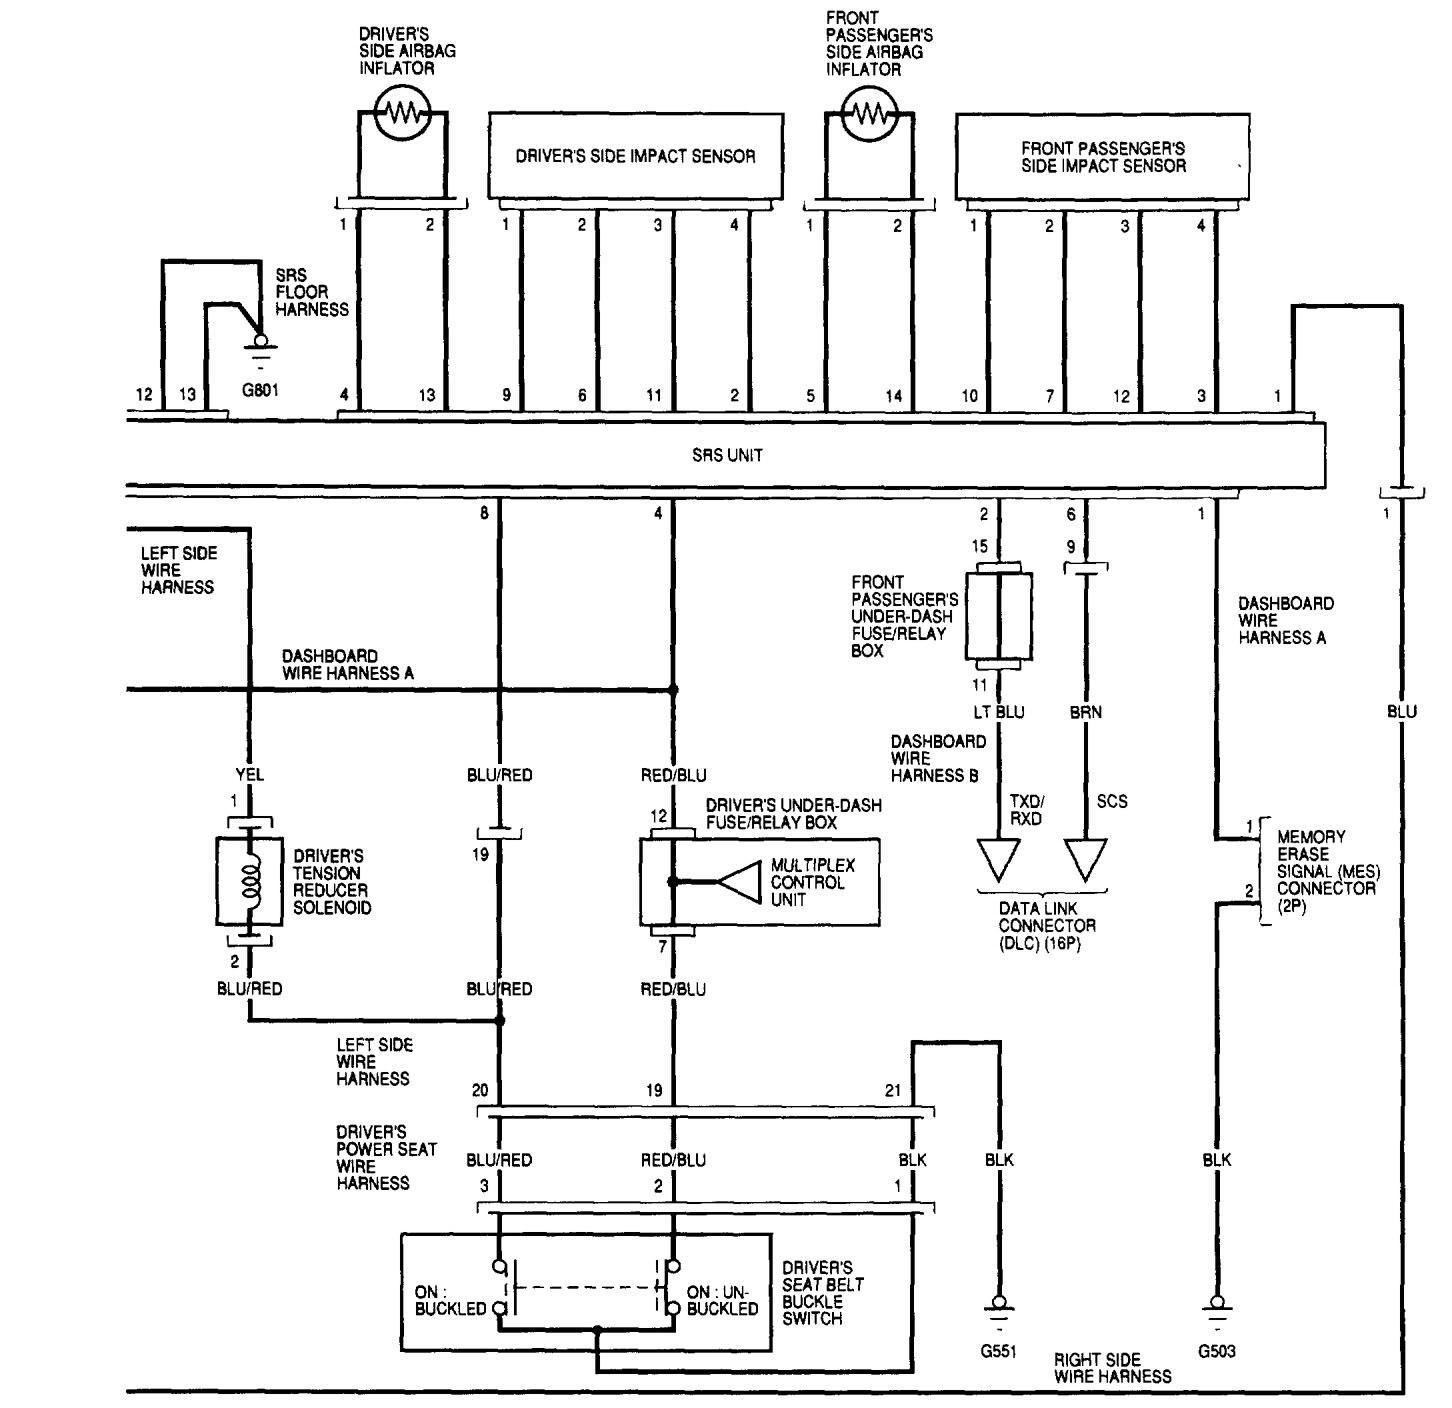 acura tl  2002  - wiring diagrams - air bags